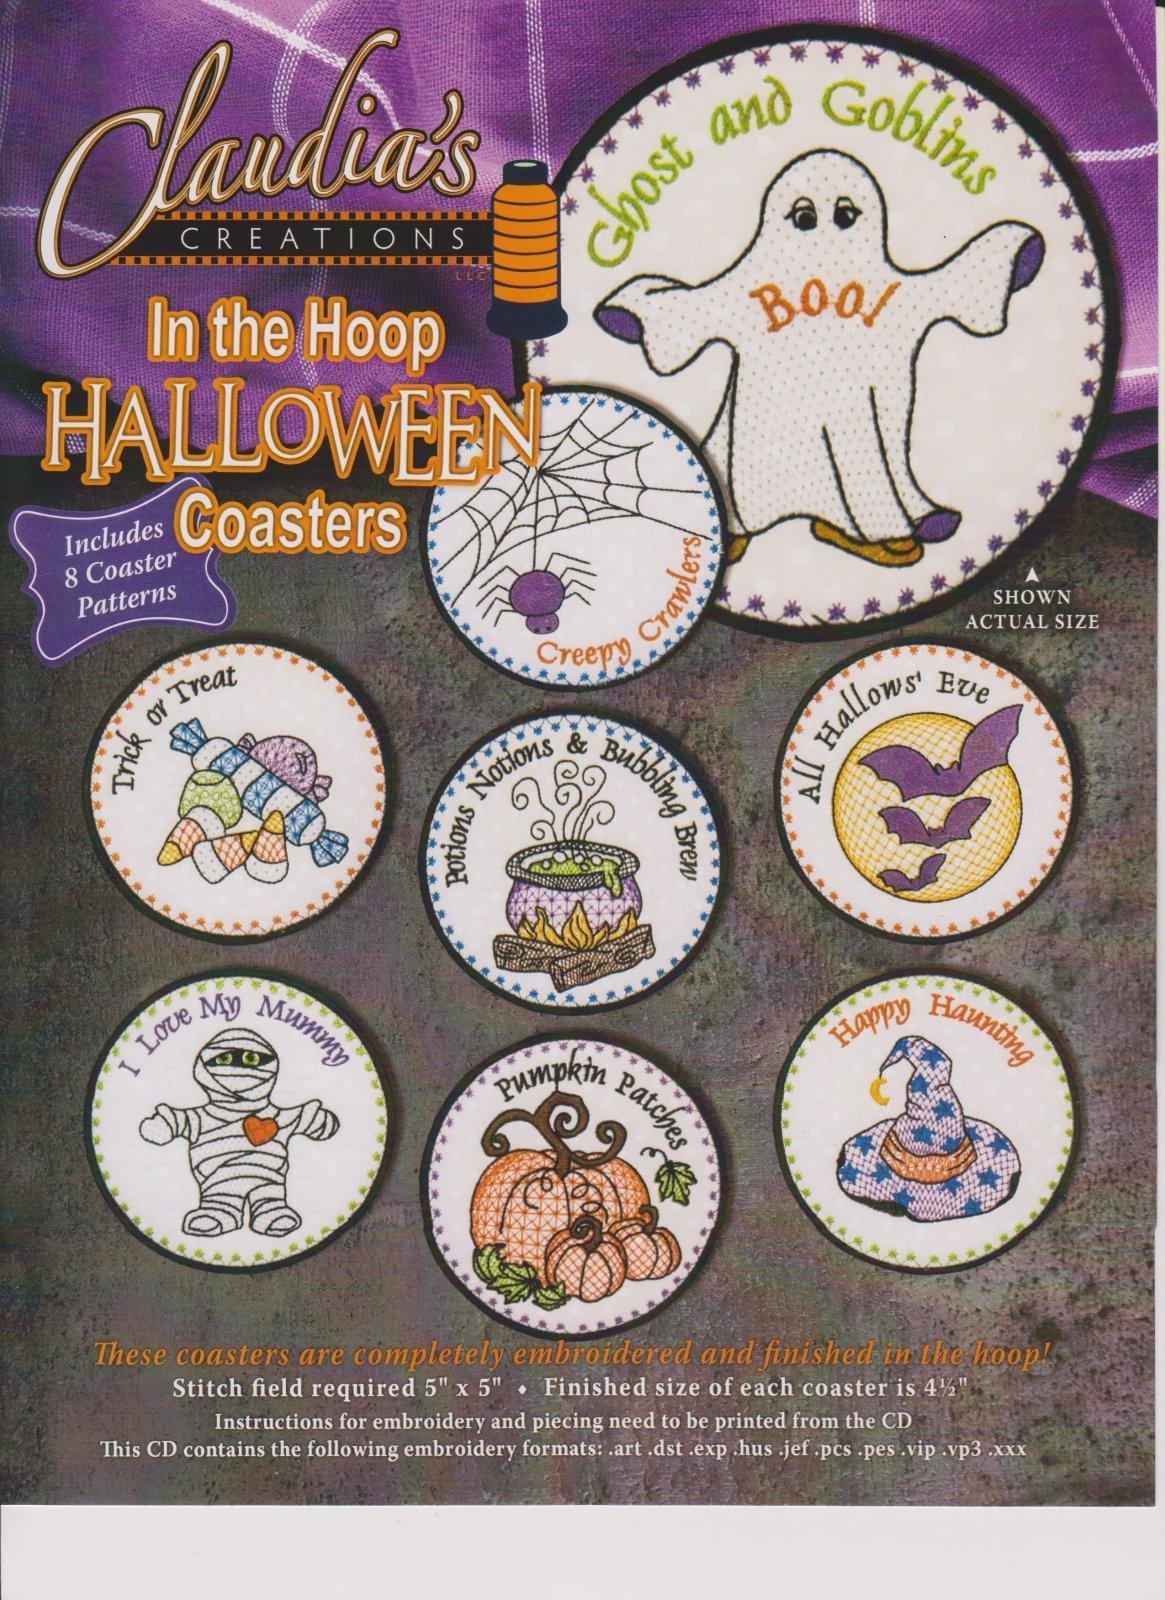 In the Hoop Halloween Coasters